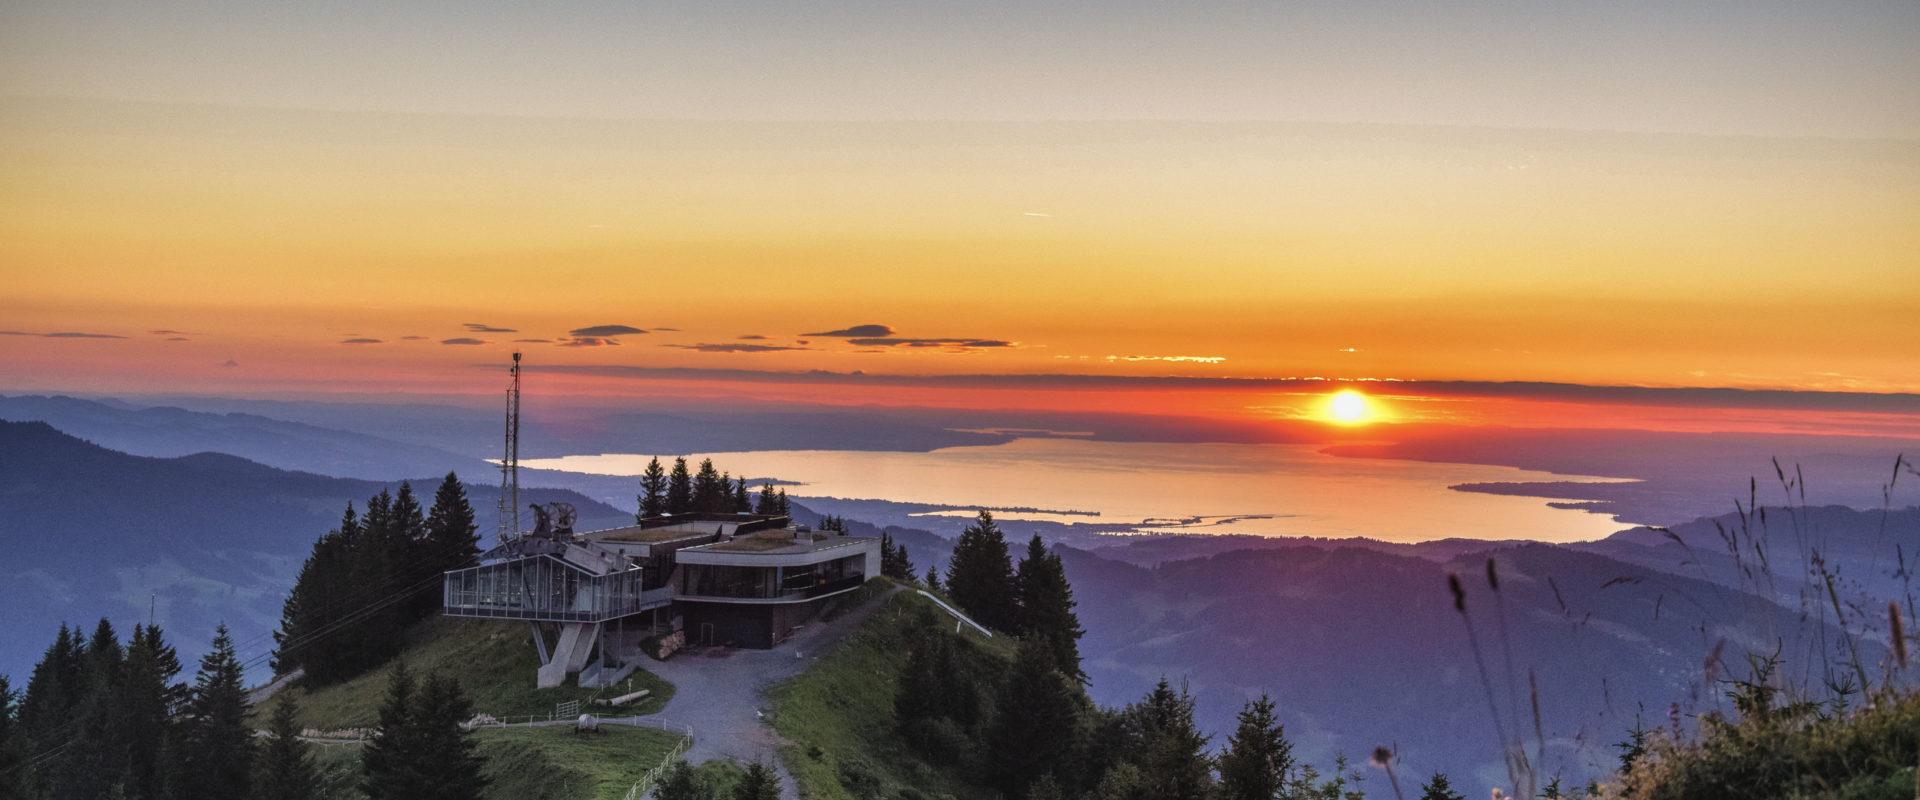 Bergstation Baumgarten Seilbahn Bezau Sonnenuntergang Sommer © Michael Meusburger undefined